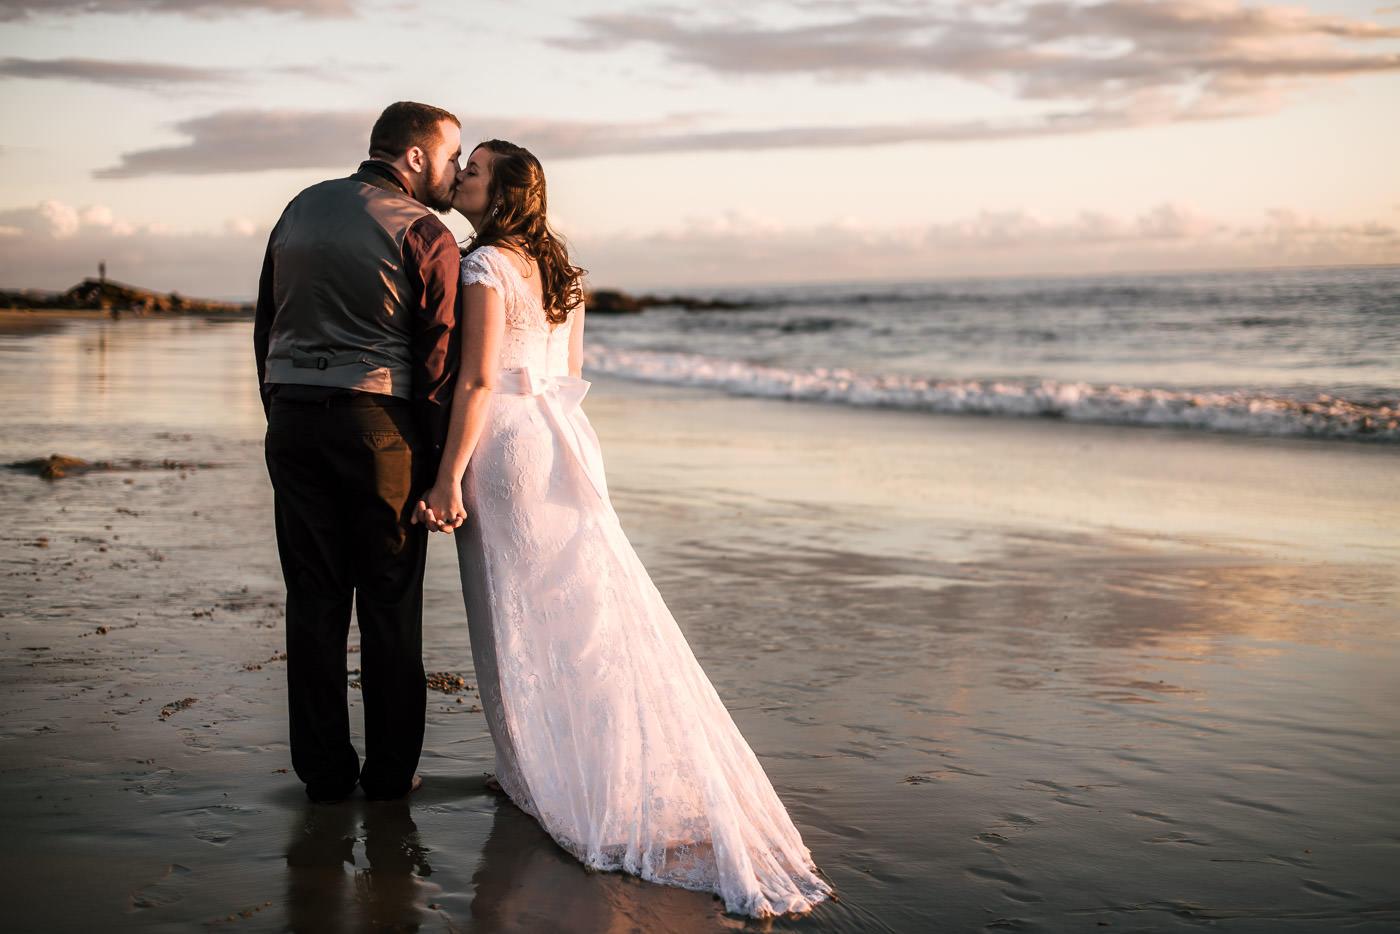 Wedding Photographer near Laguna beach takes a romantic photograph at sunset.